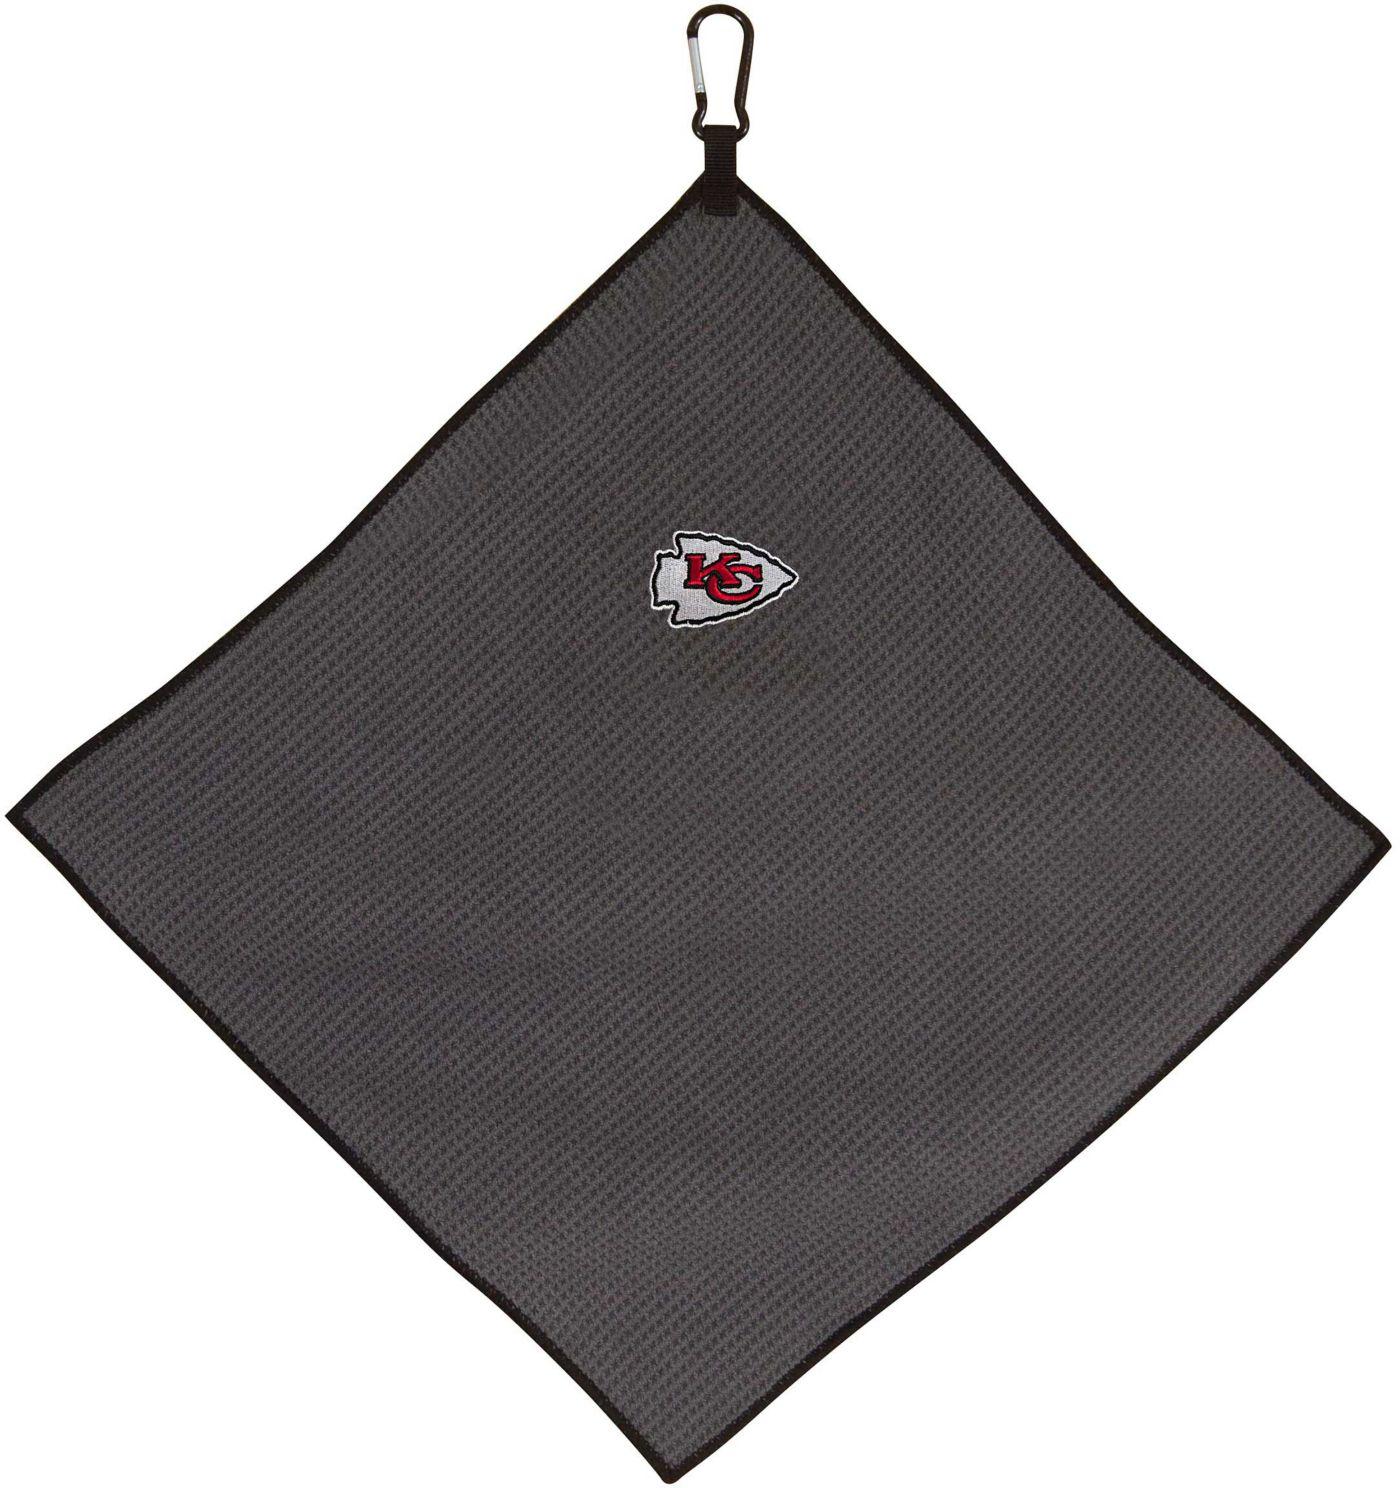 "Team Effort Kansas City Chiefs 15"" x 15"" Microfiber Golf Towel"